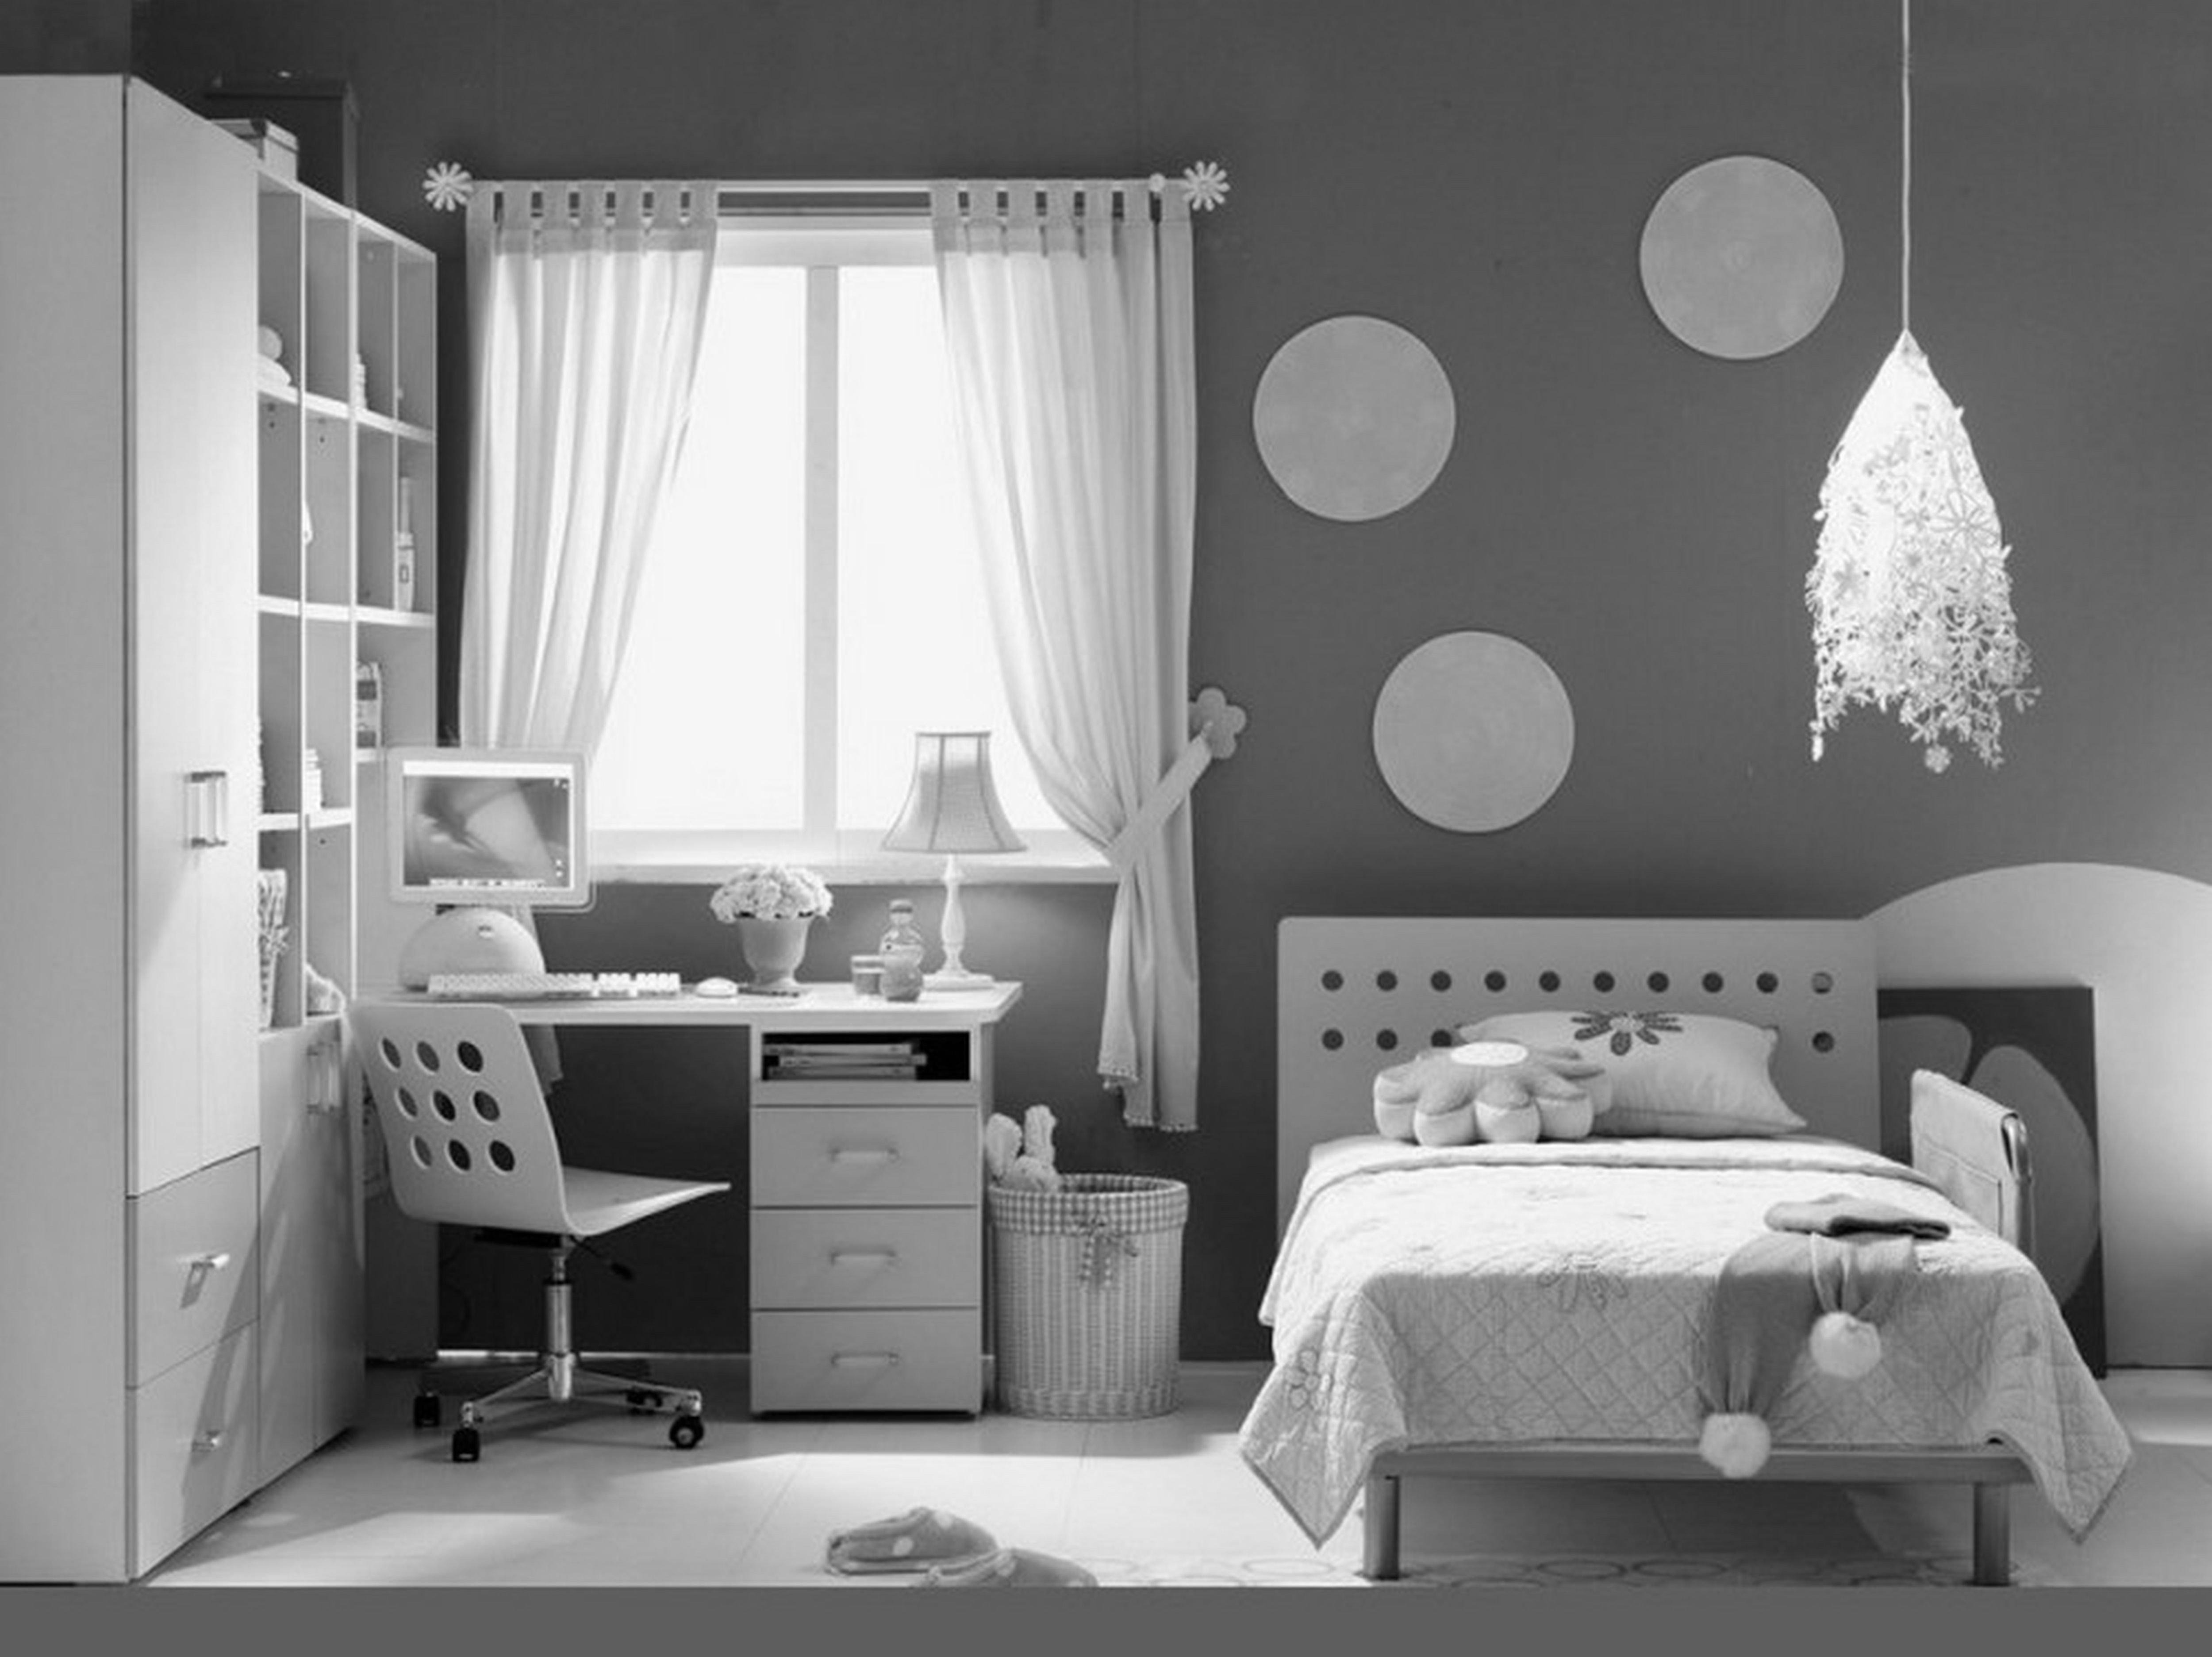 Teen Bedroom Wall Decor Fresh Cute Wall Decor Ideas for Bedroom Wall Decor Diy